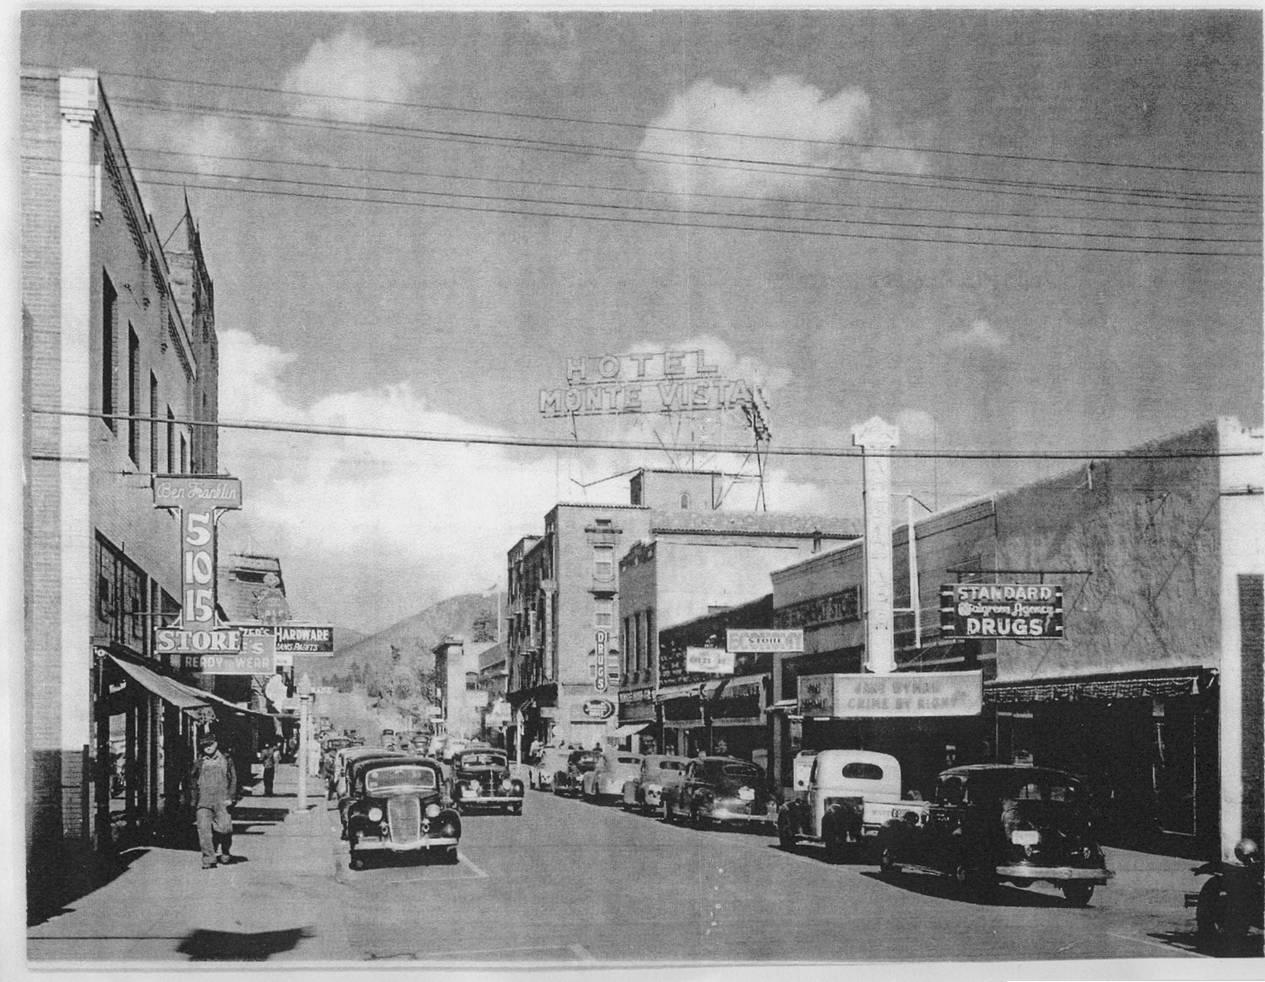 Economy Store, Flagstaff, Arizona, circa 1944